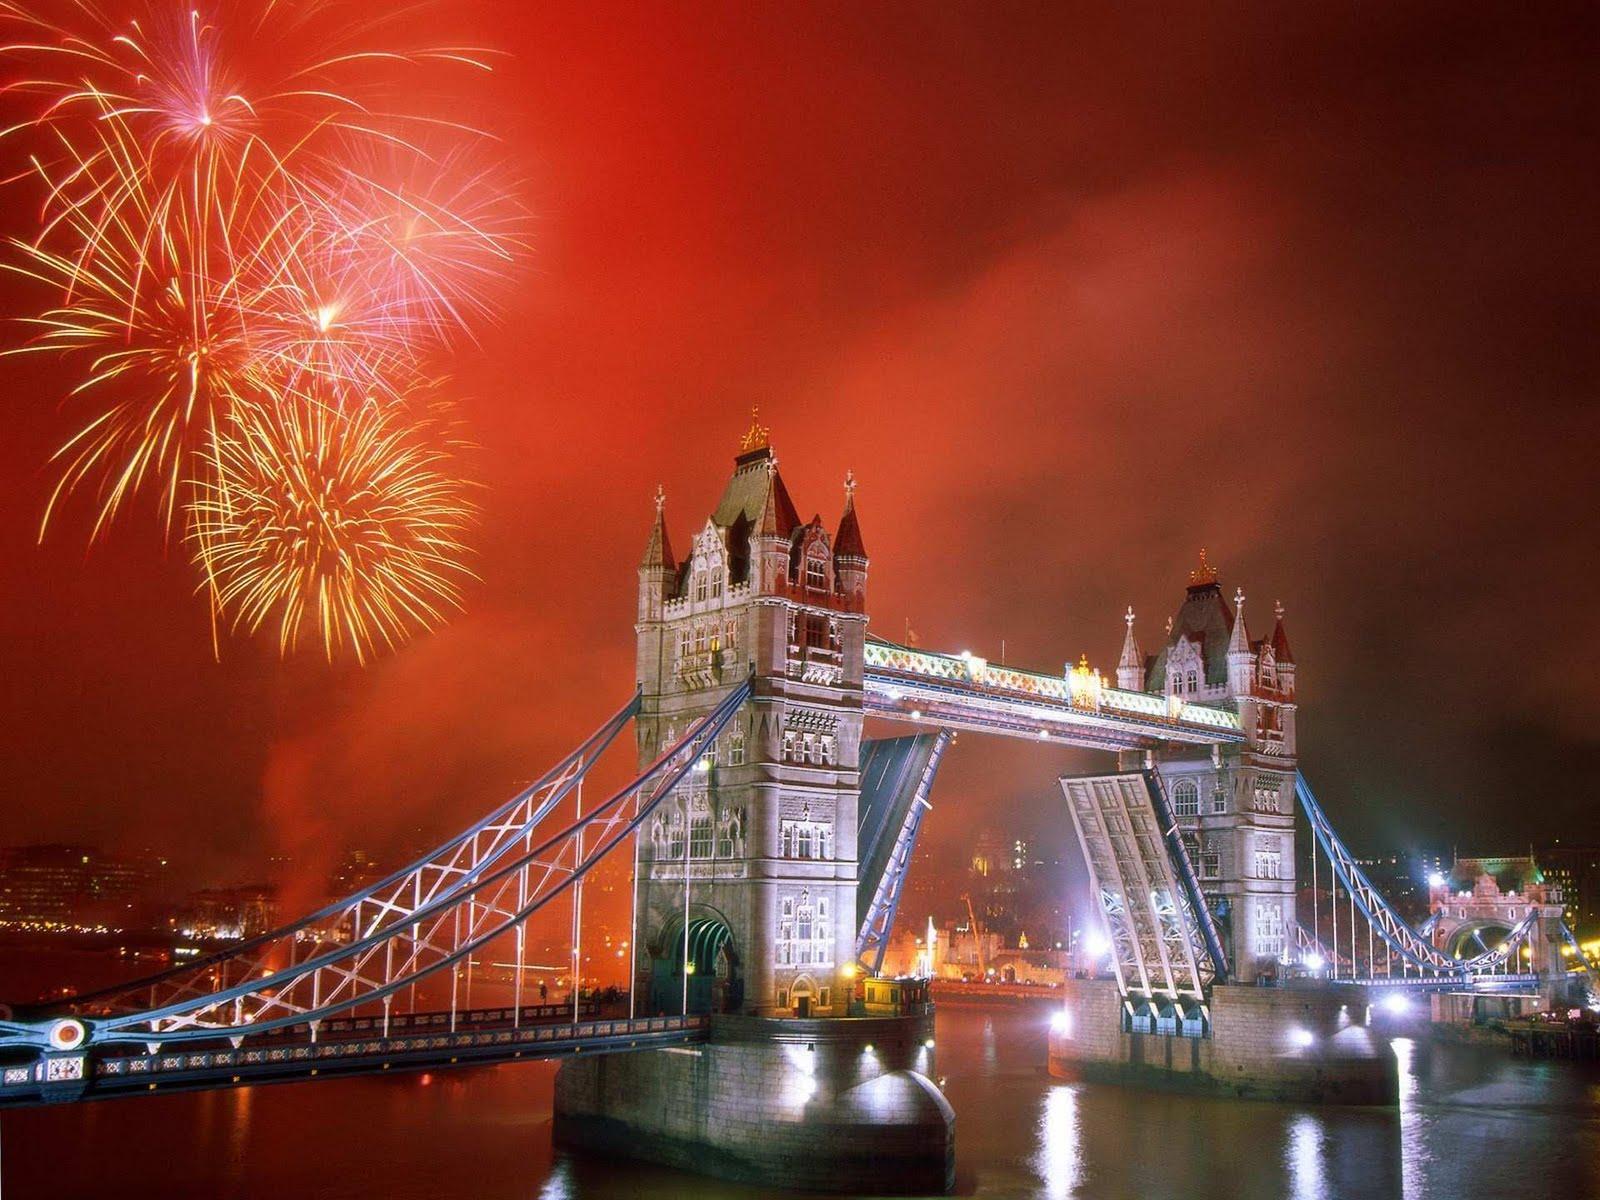 london bridge wallpaper All free download  - tower bridge at night wallpapers